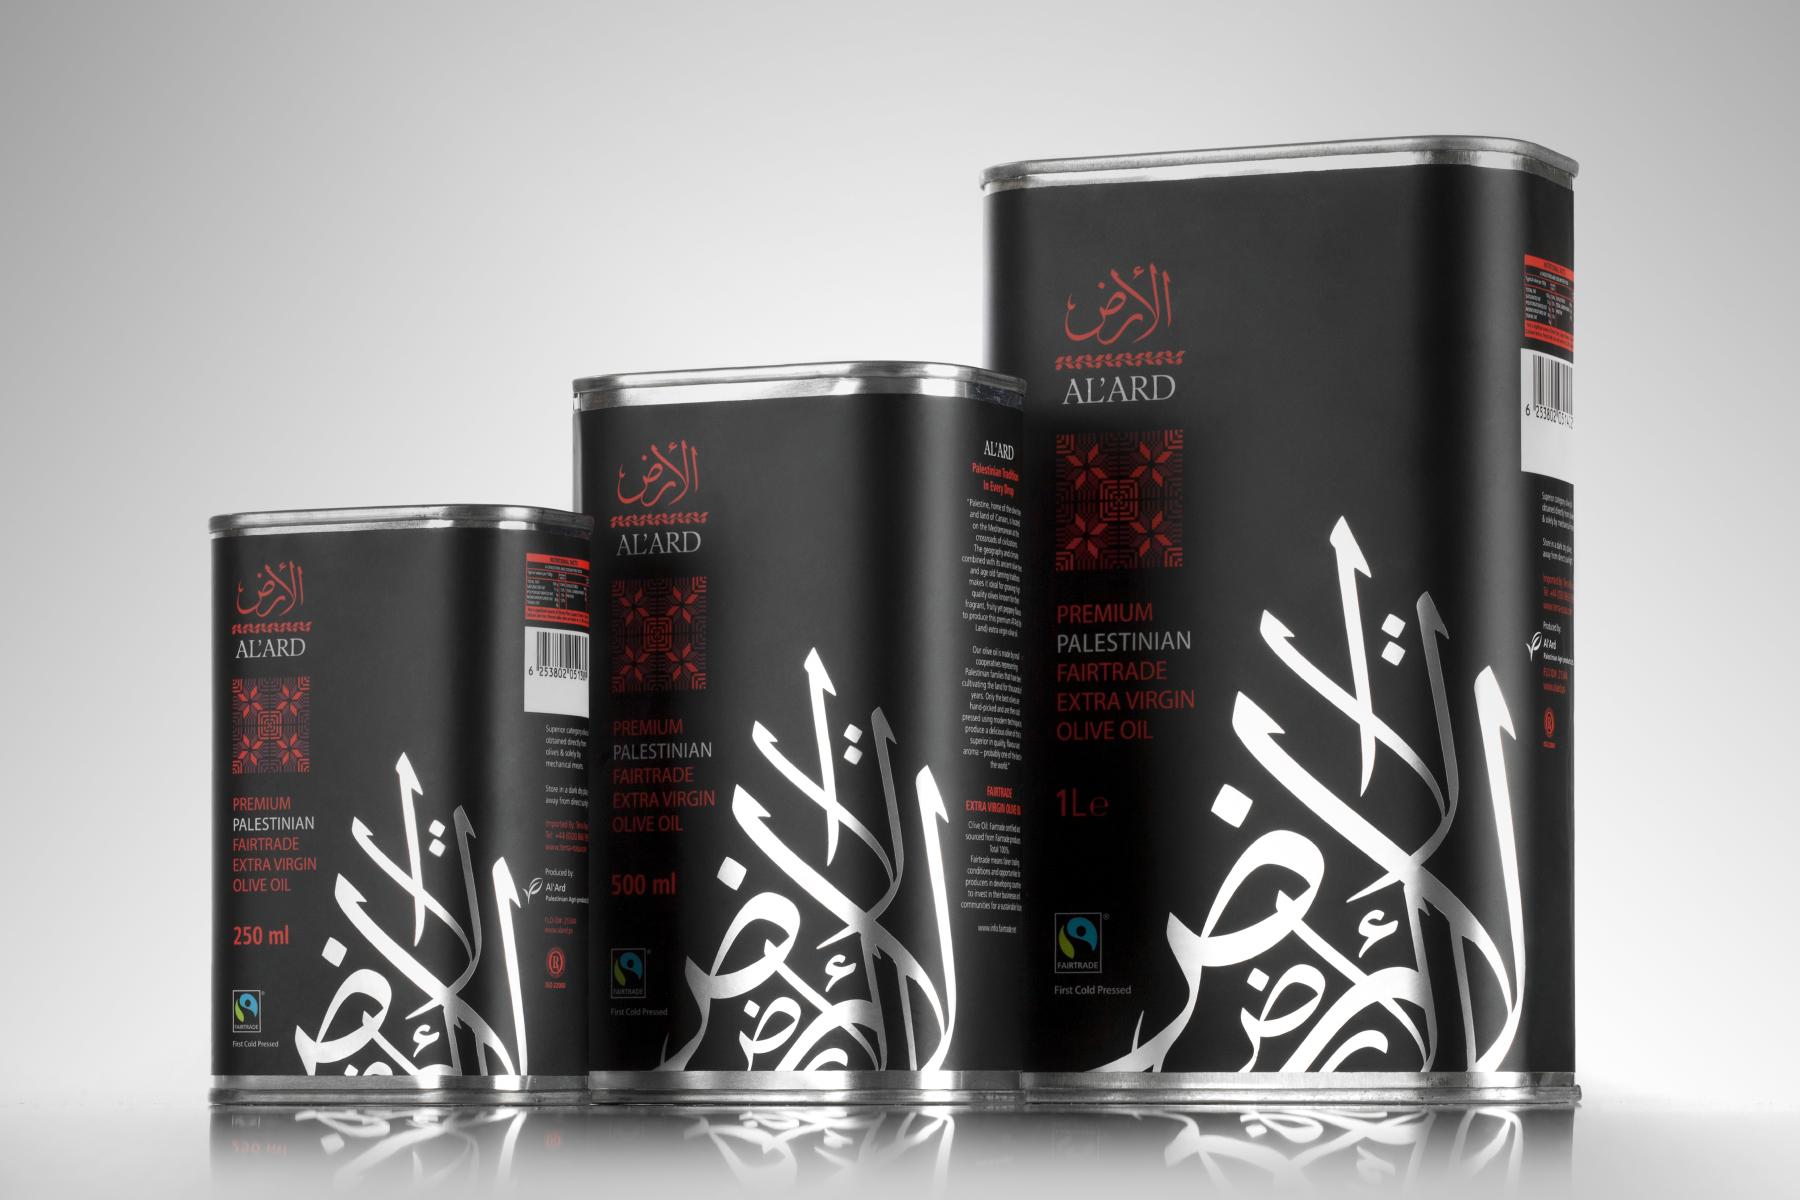 Al'Ard Olive Oil